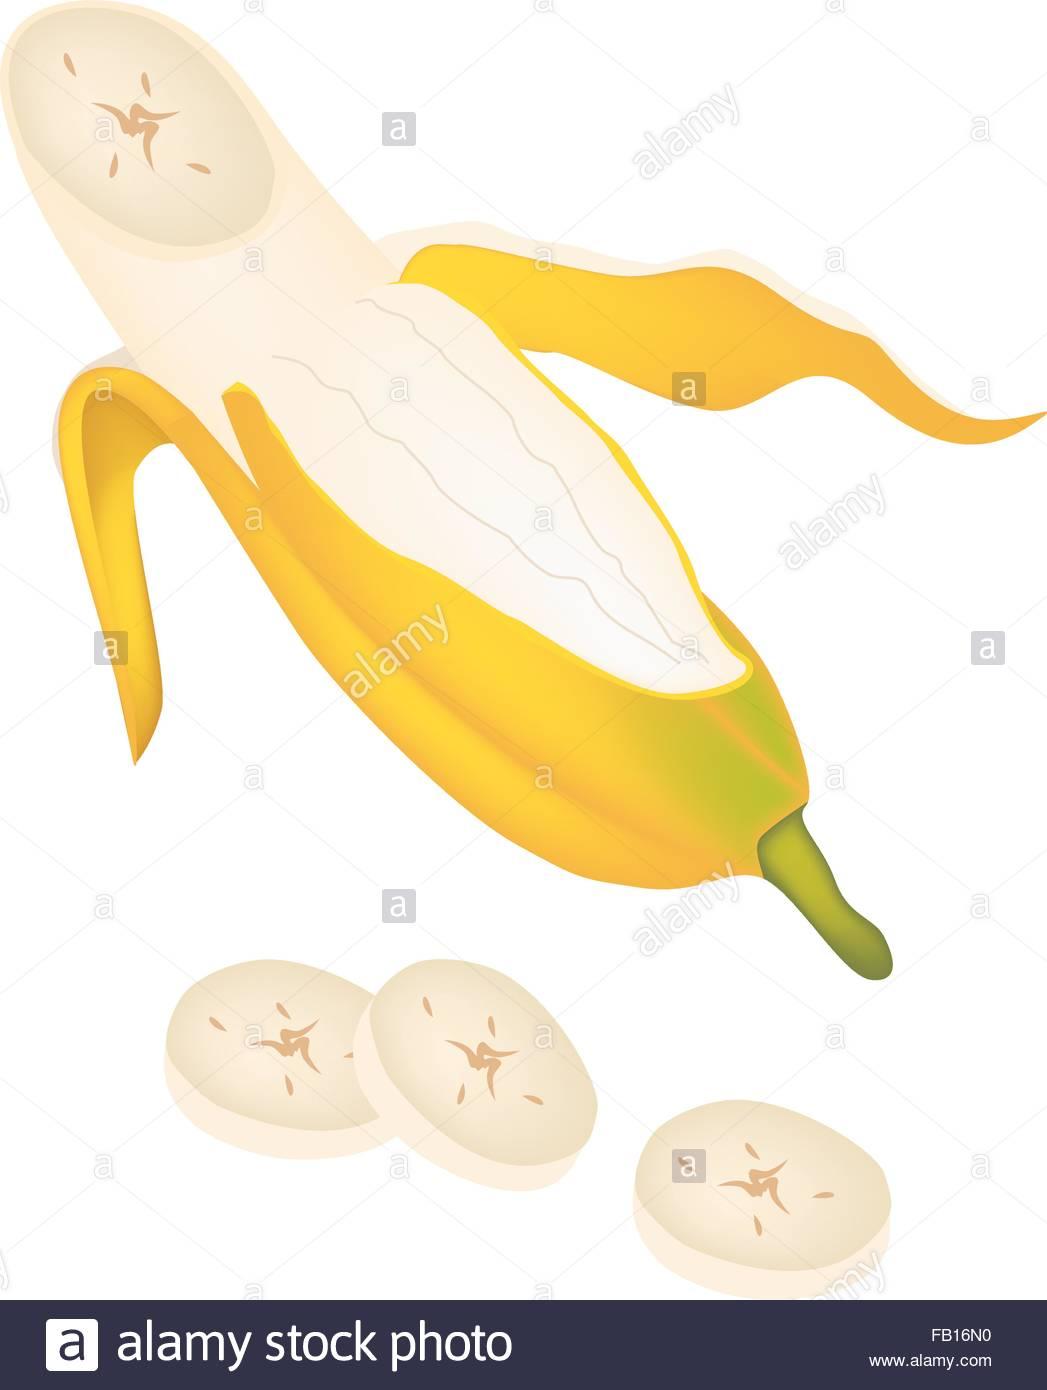 Fruit, An Illustration Of Open Wild Banana, Asian Banana Or Stock.